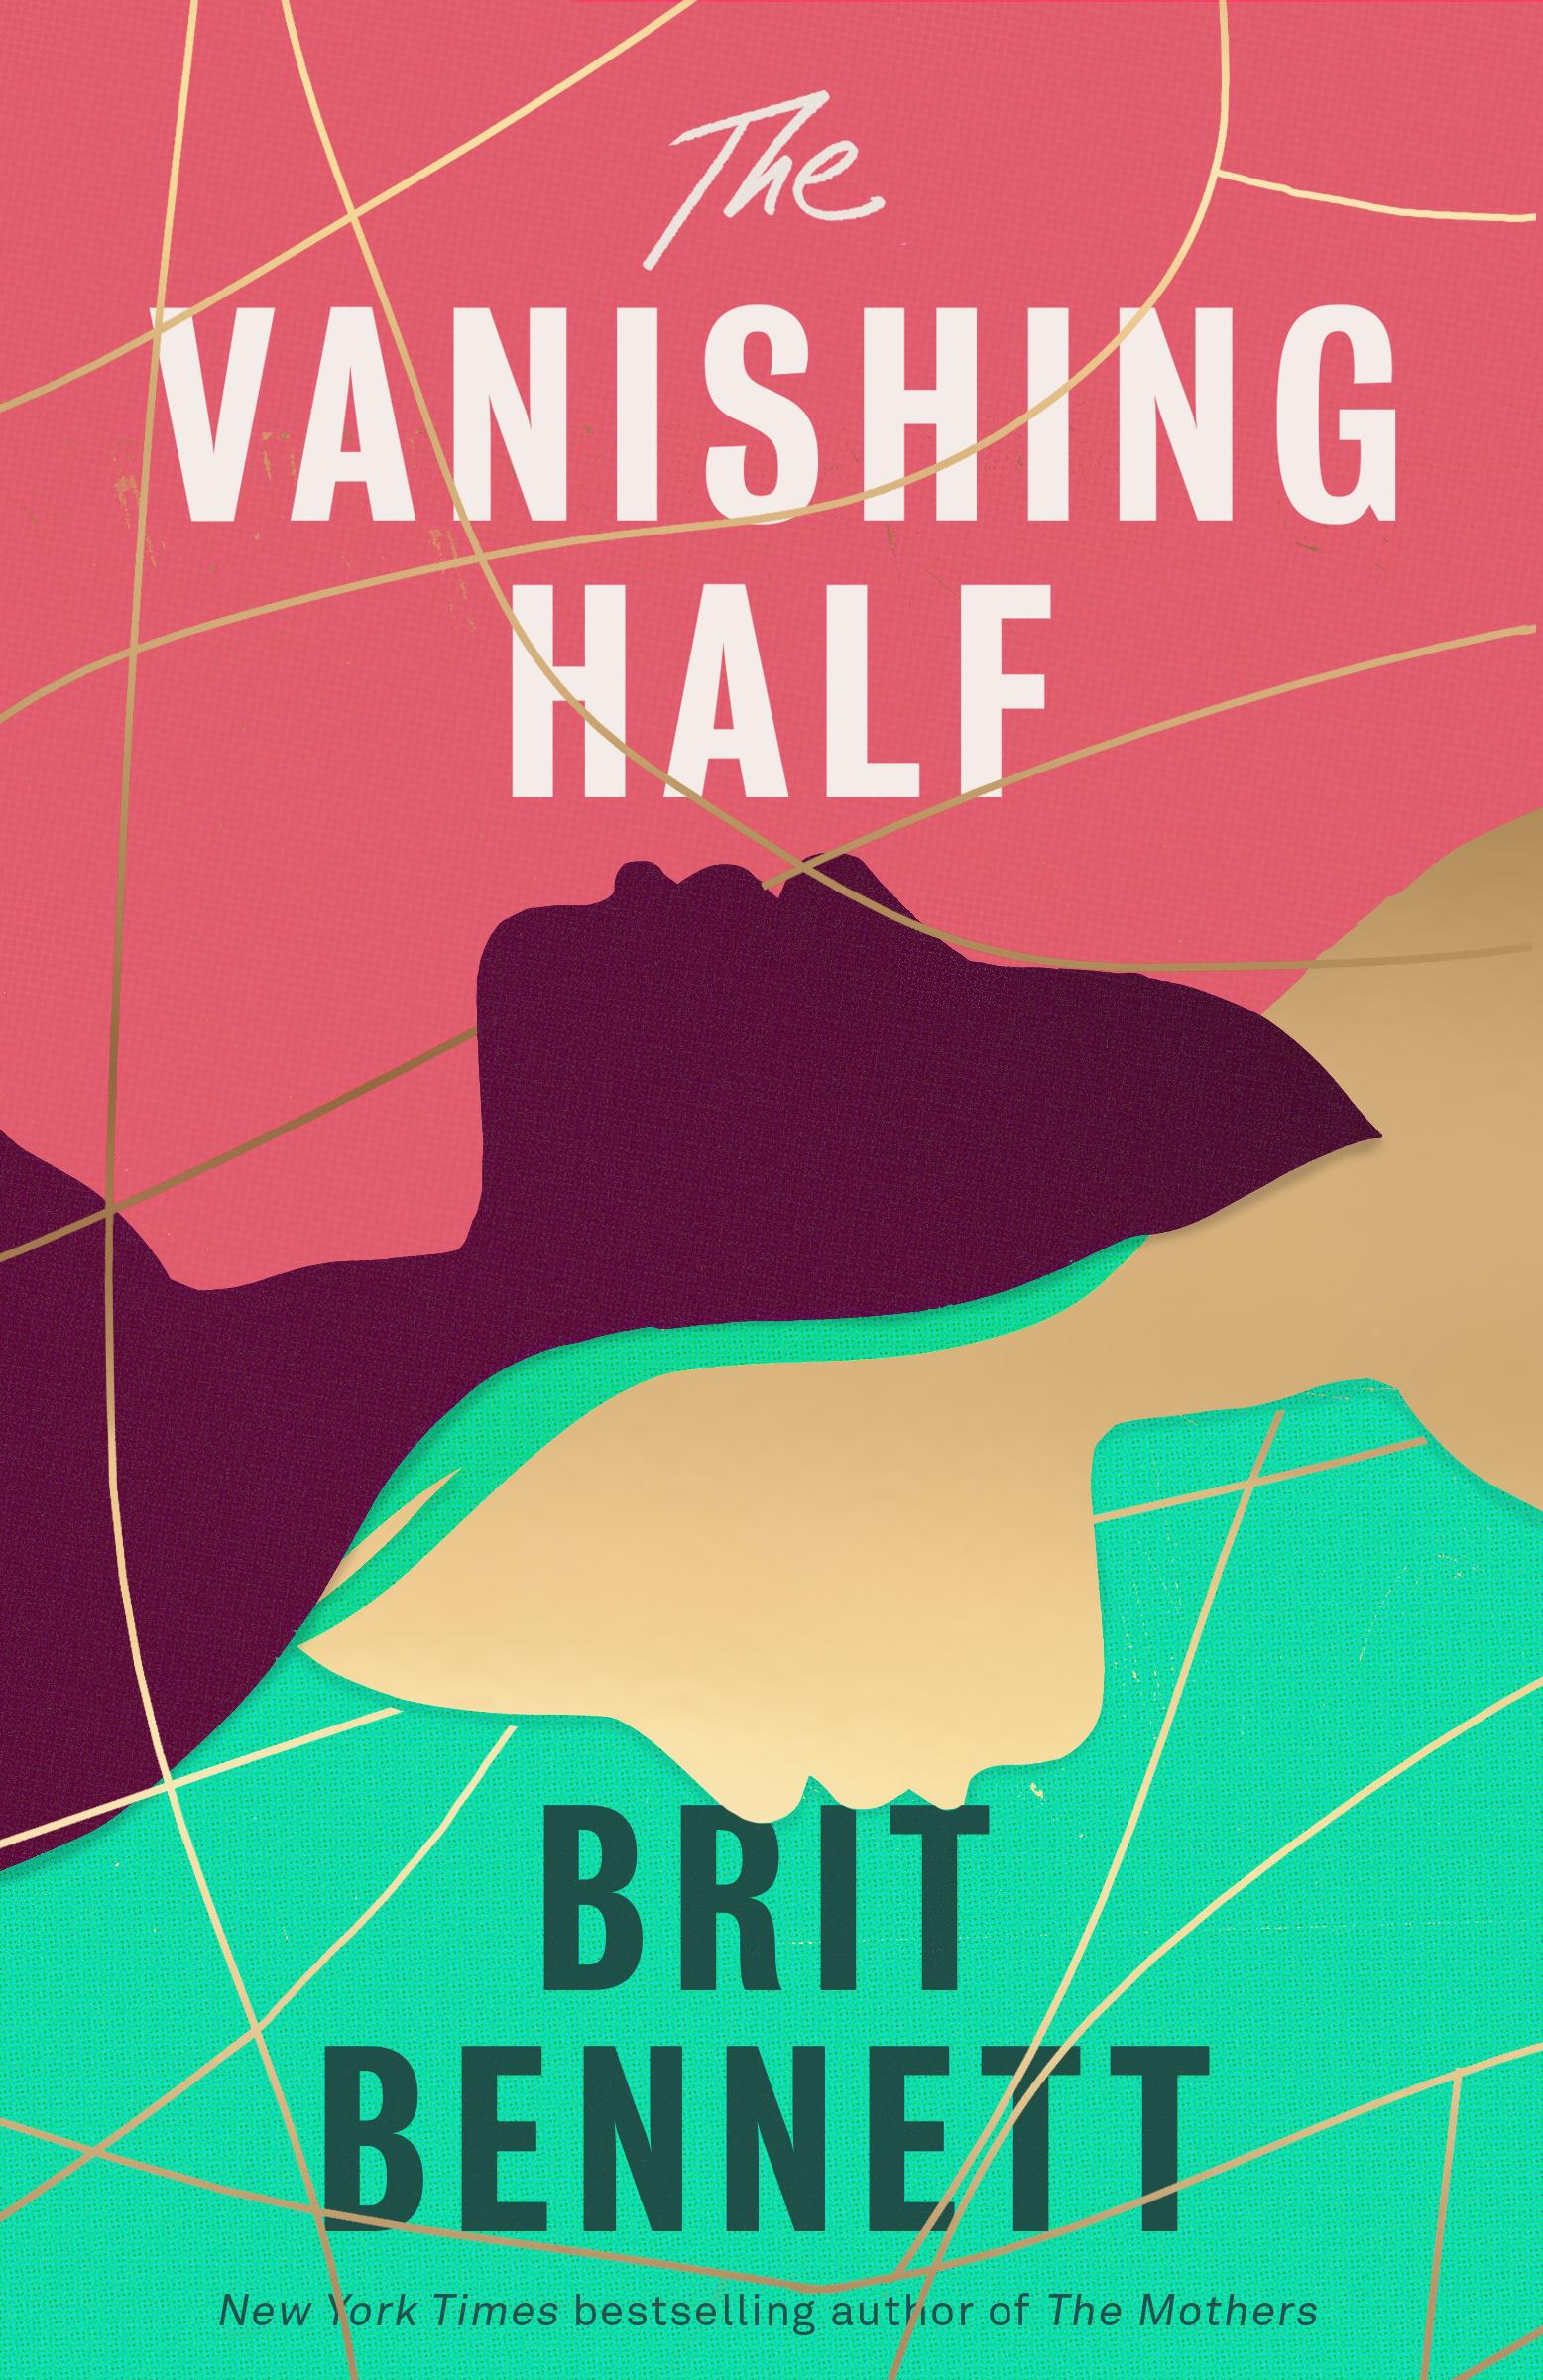 The Vanishing Half by Brit Bennett